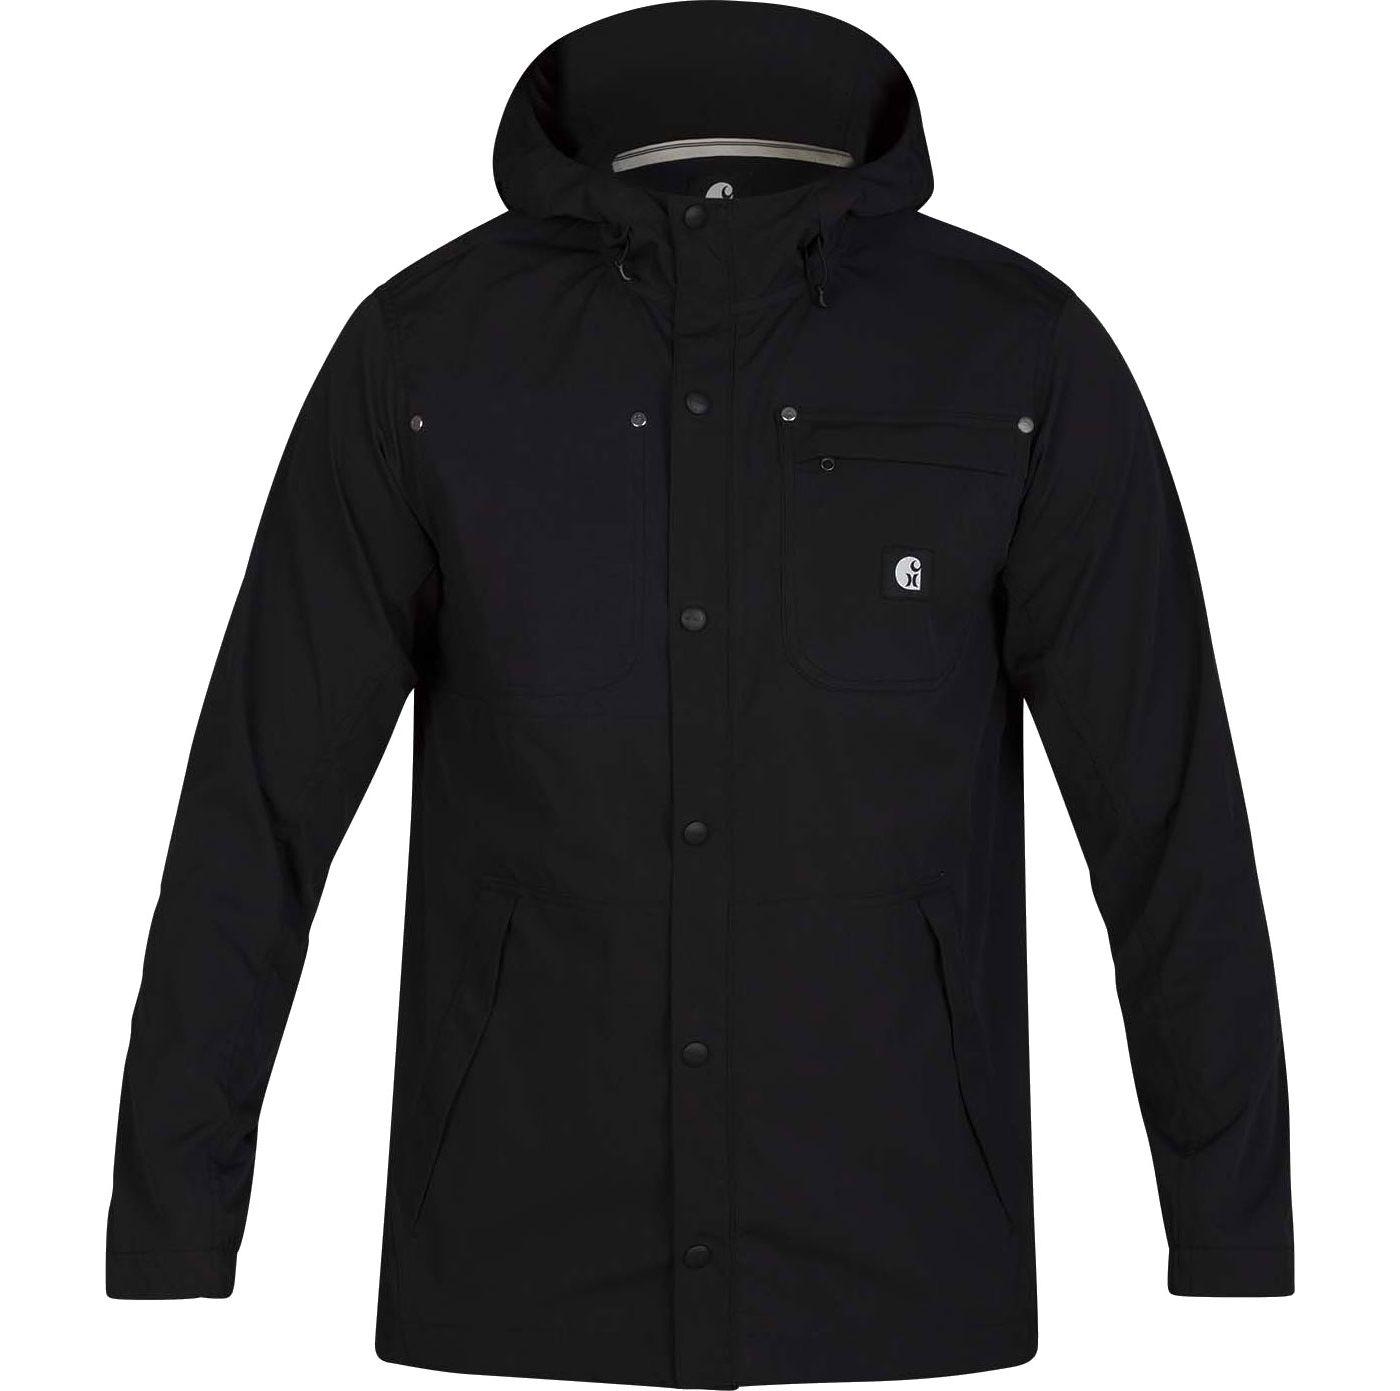 Hurley Men's Carhartt Jacket